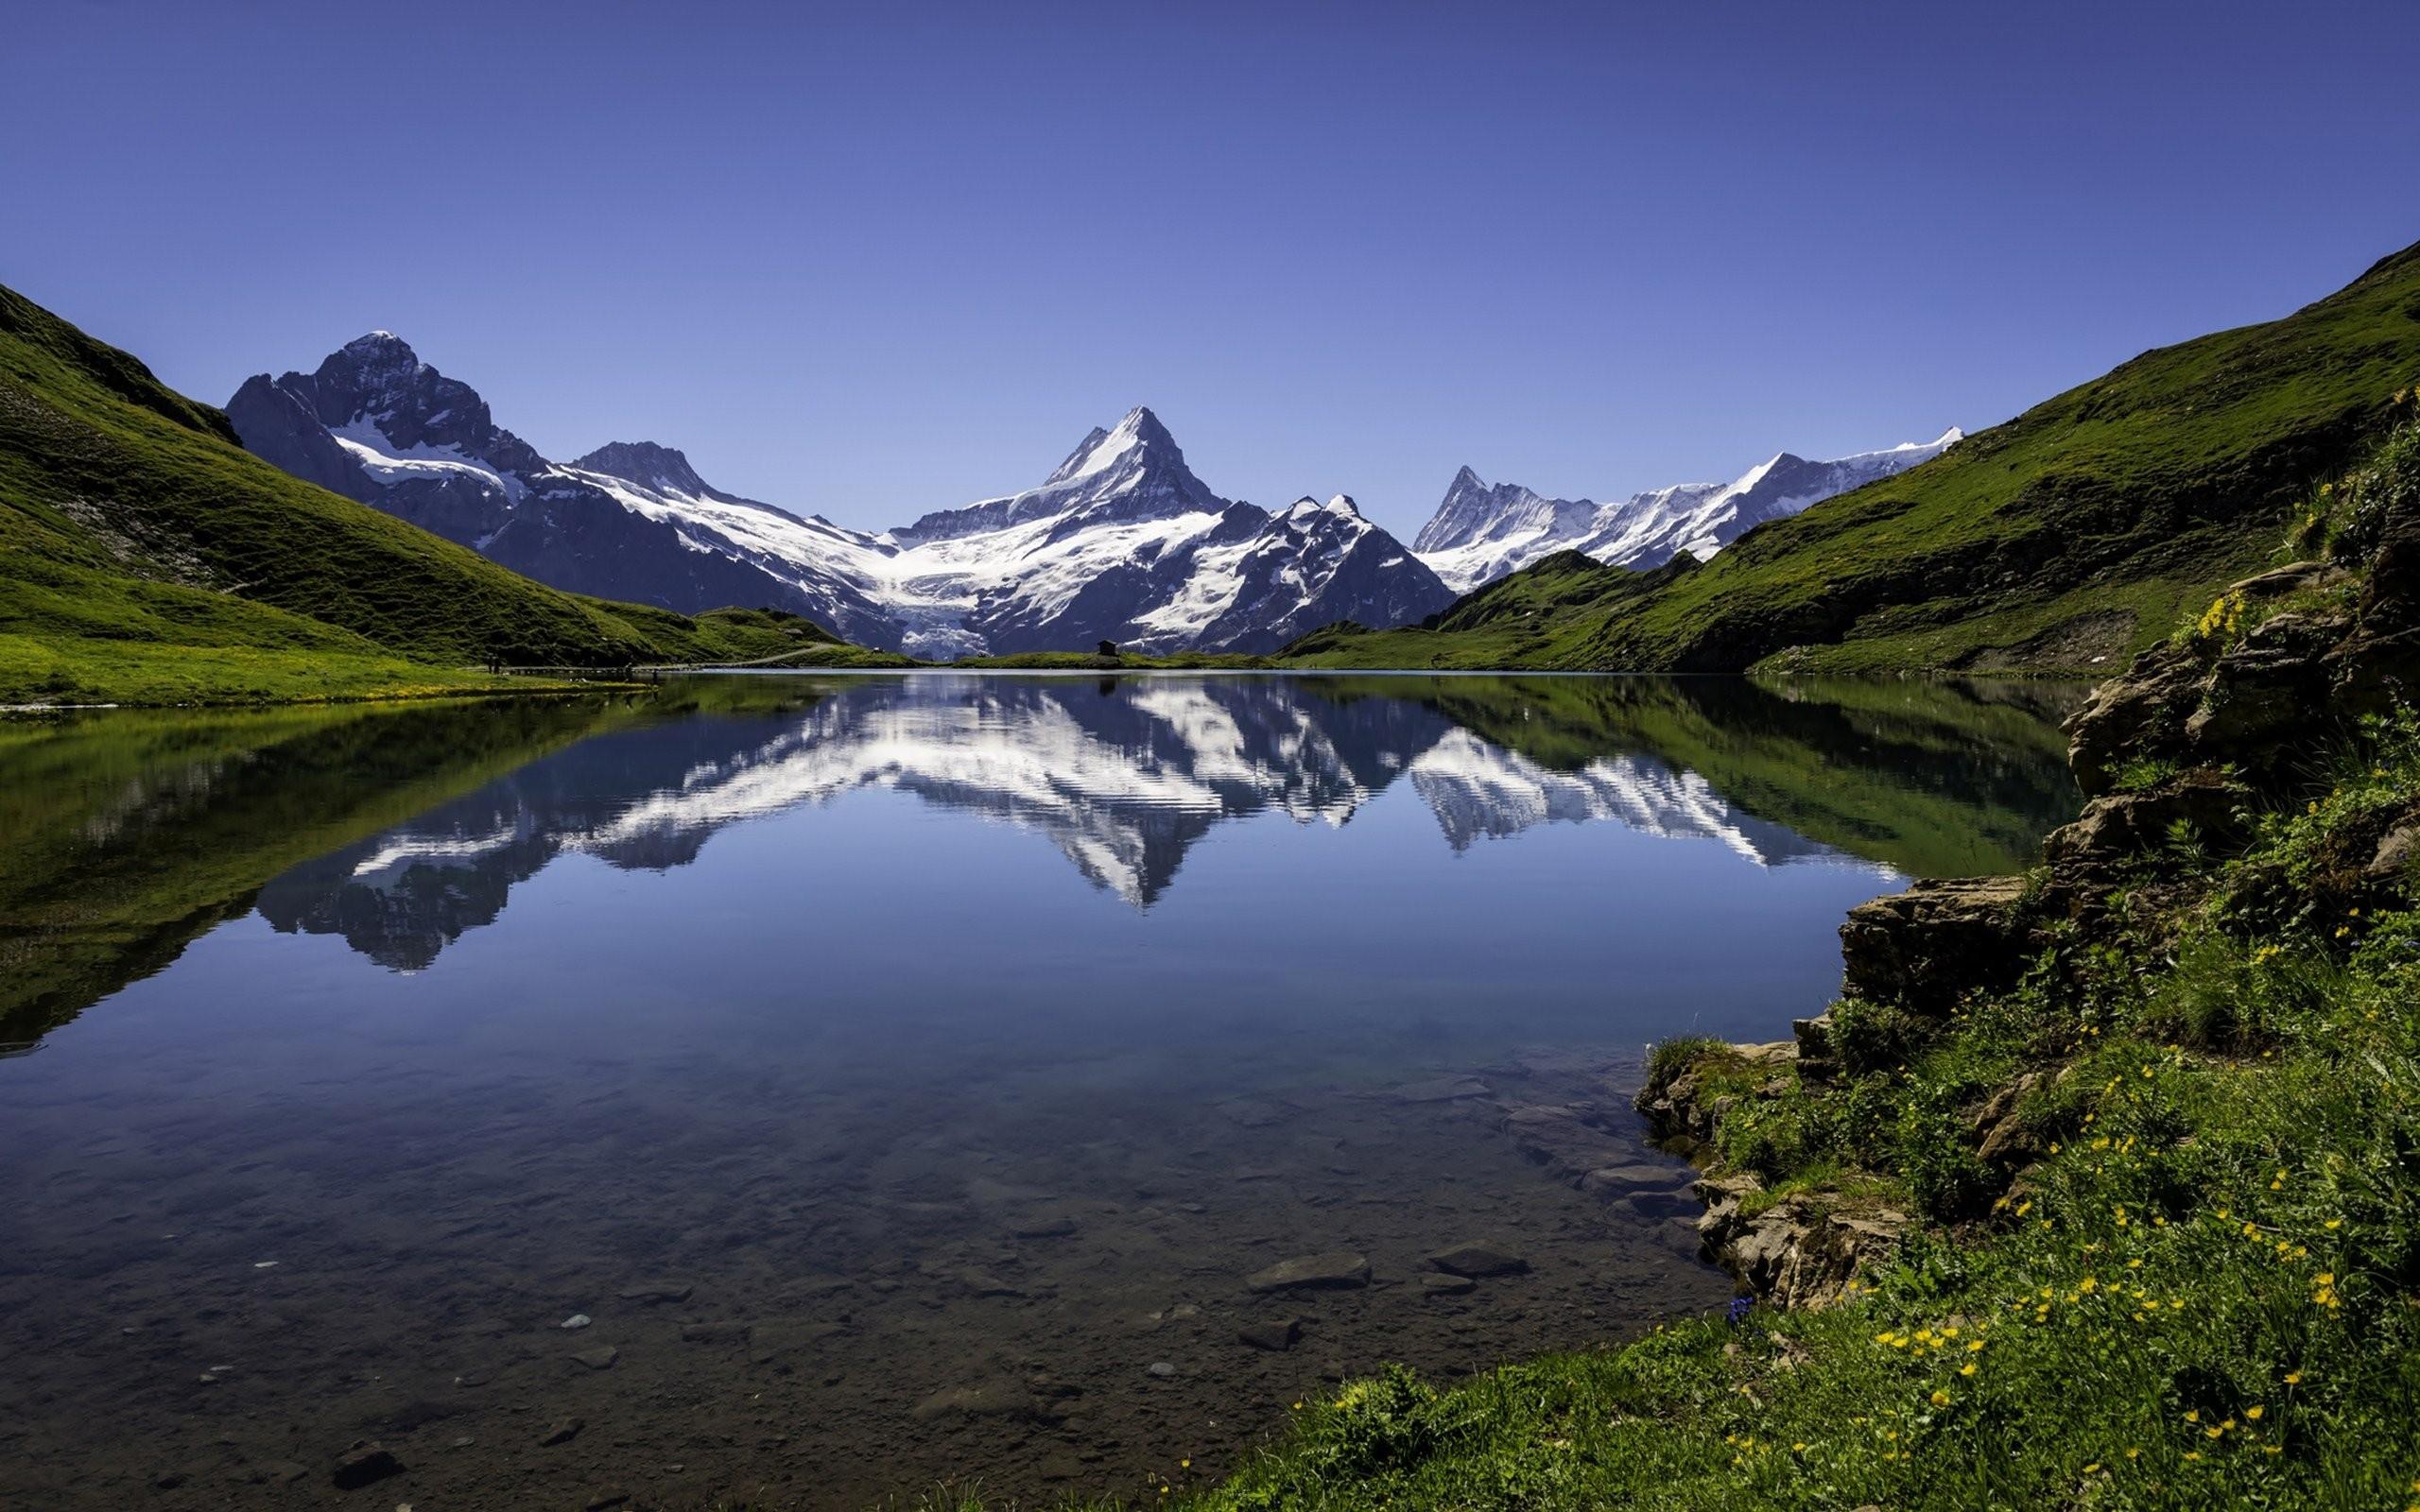 4k ultra hd nature wallpapers,mountainous landforms,mountain,natural landscape,nature,reflection